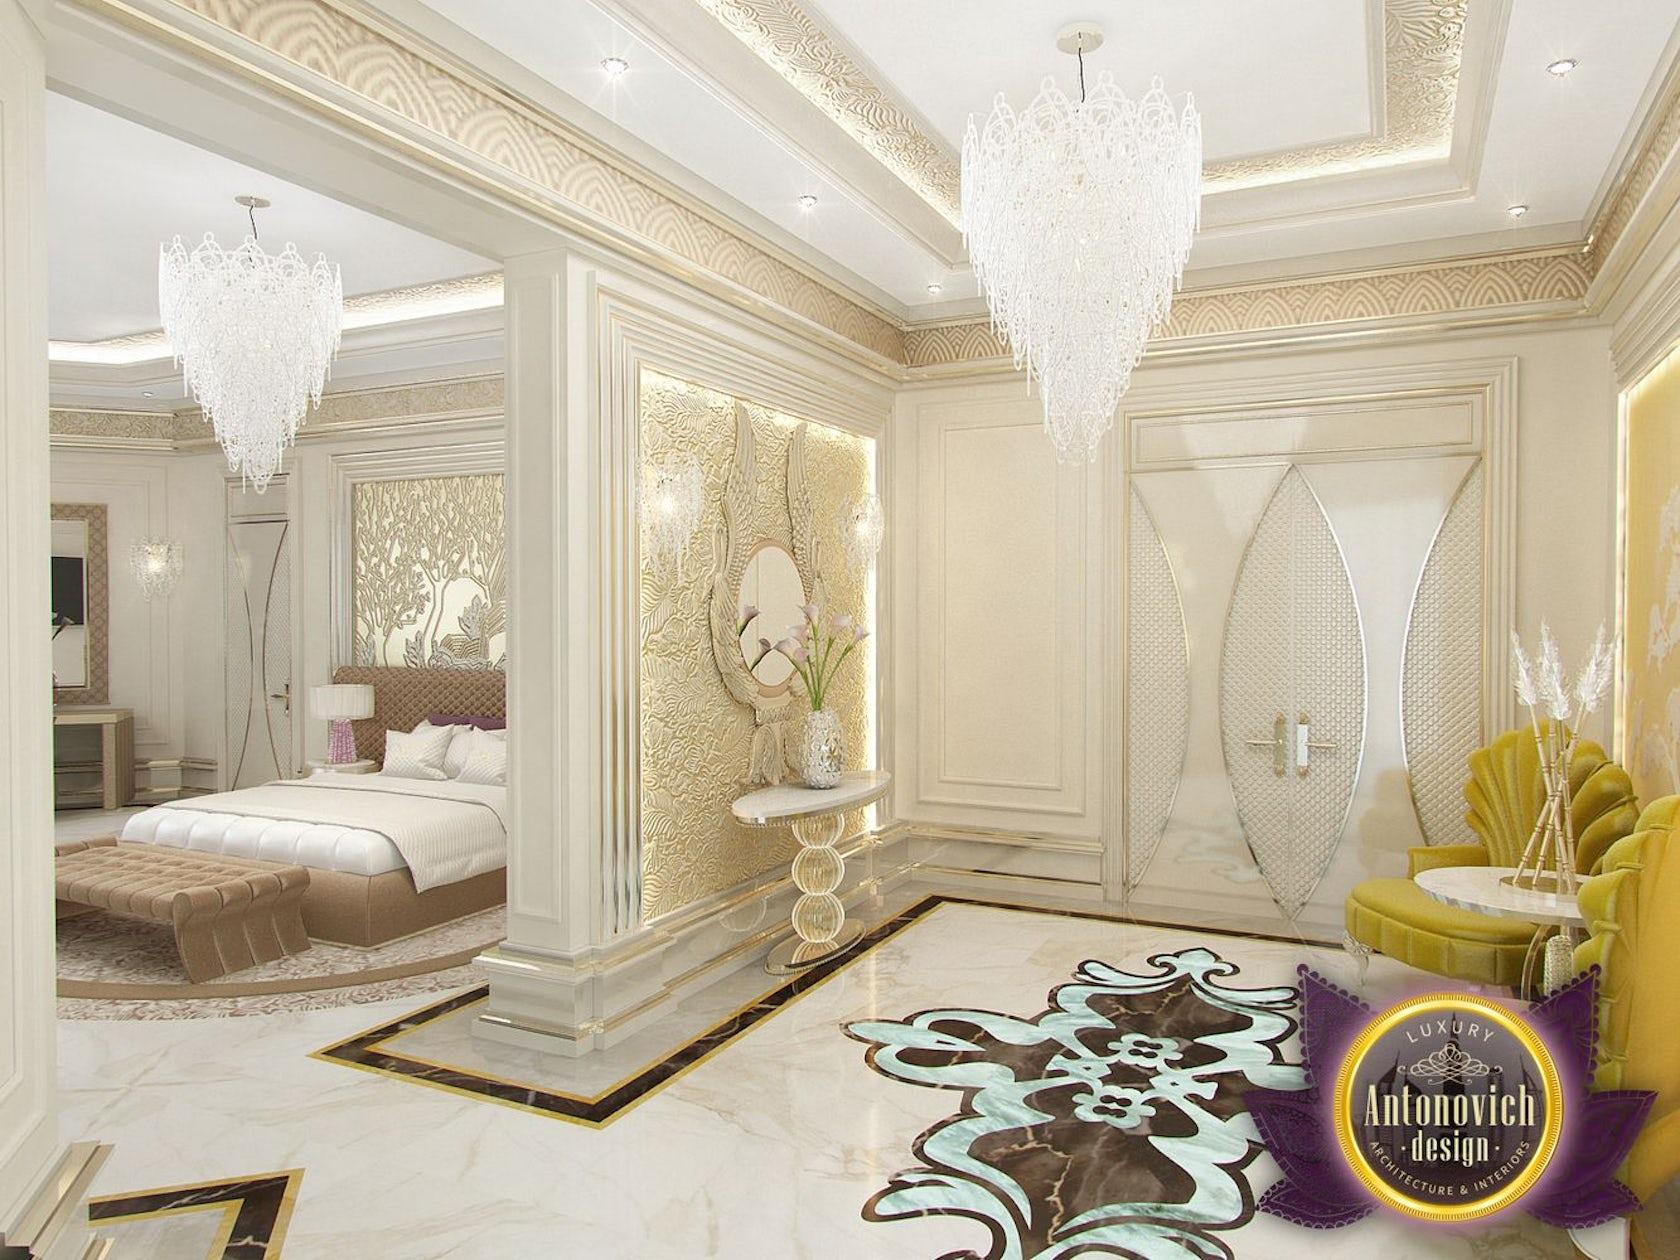 Kitchen Design Usa By Katrina Antonovich: Modern Bedroom Designs By Luxury Antonovich Design